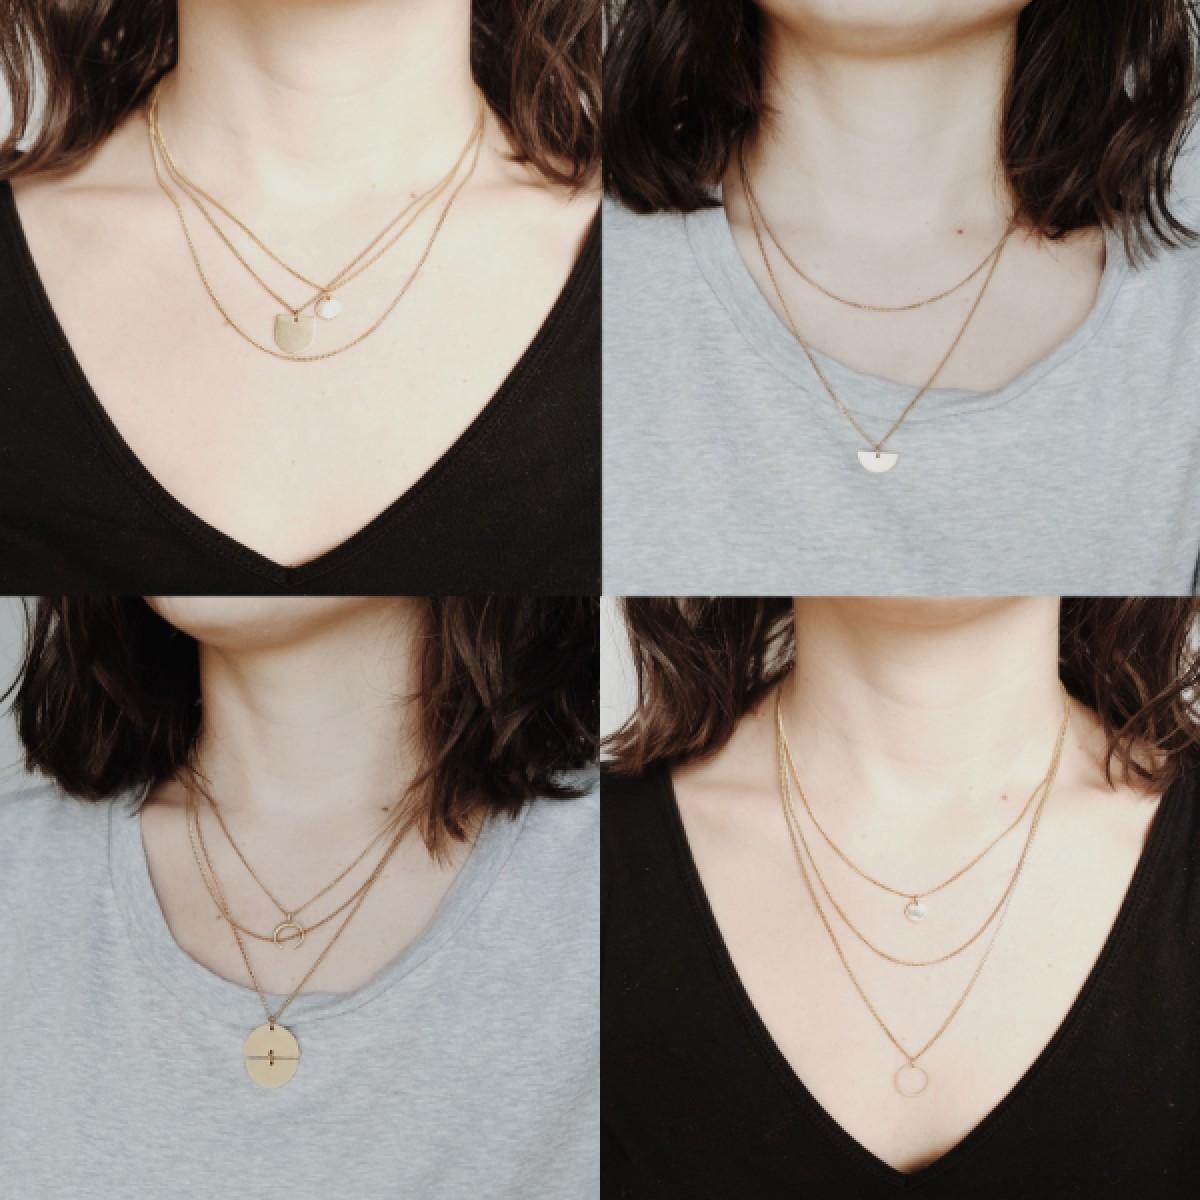 BRASSCAKE // Plain Necklace